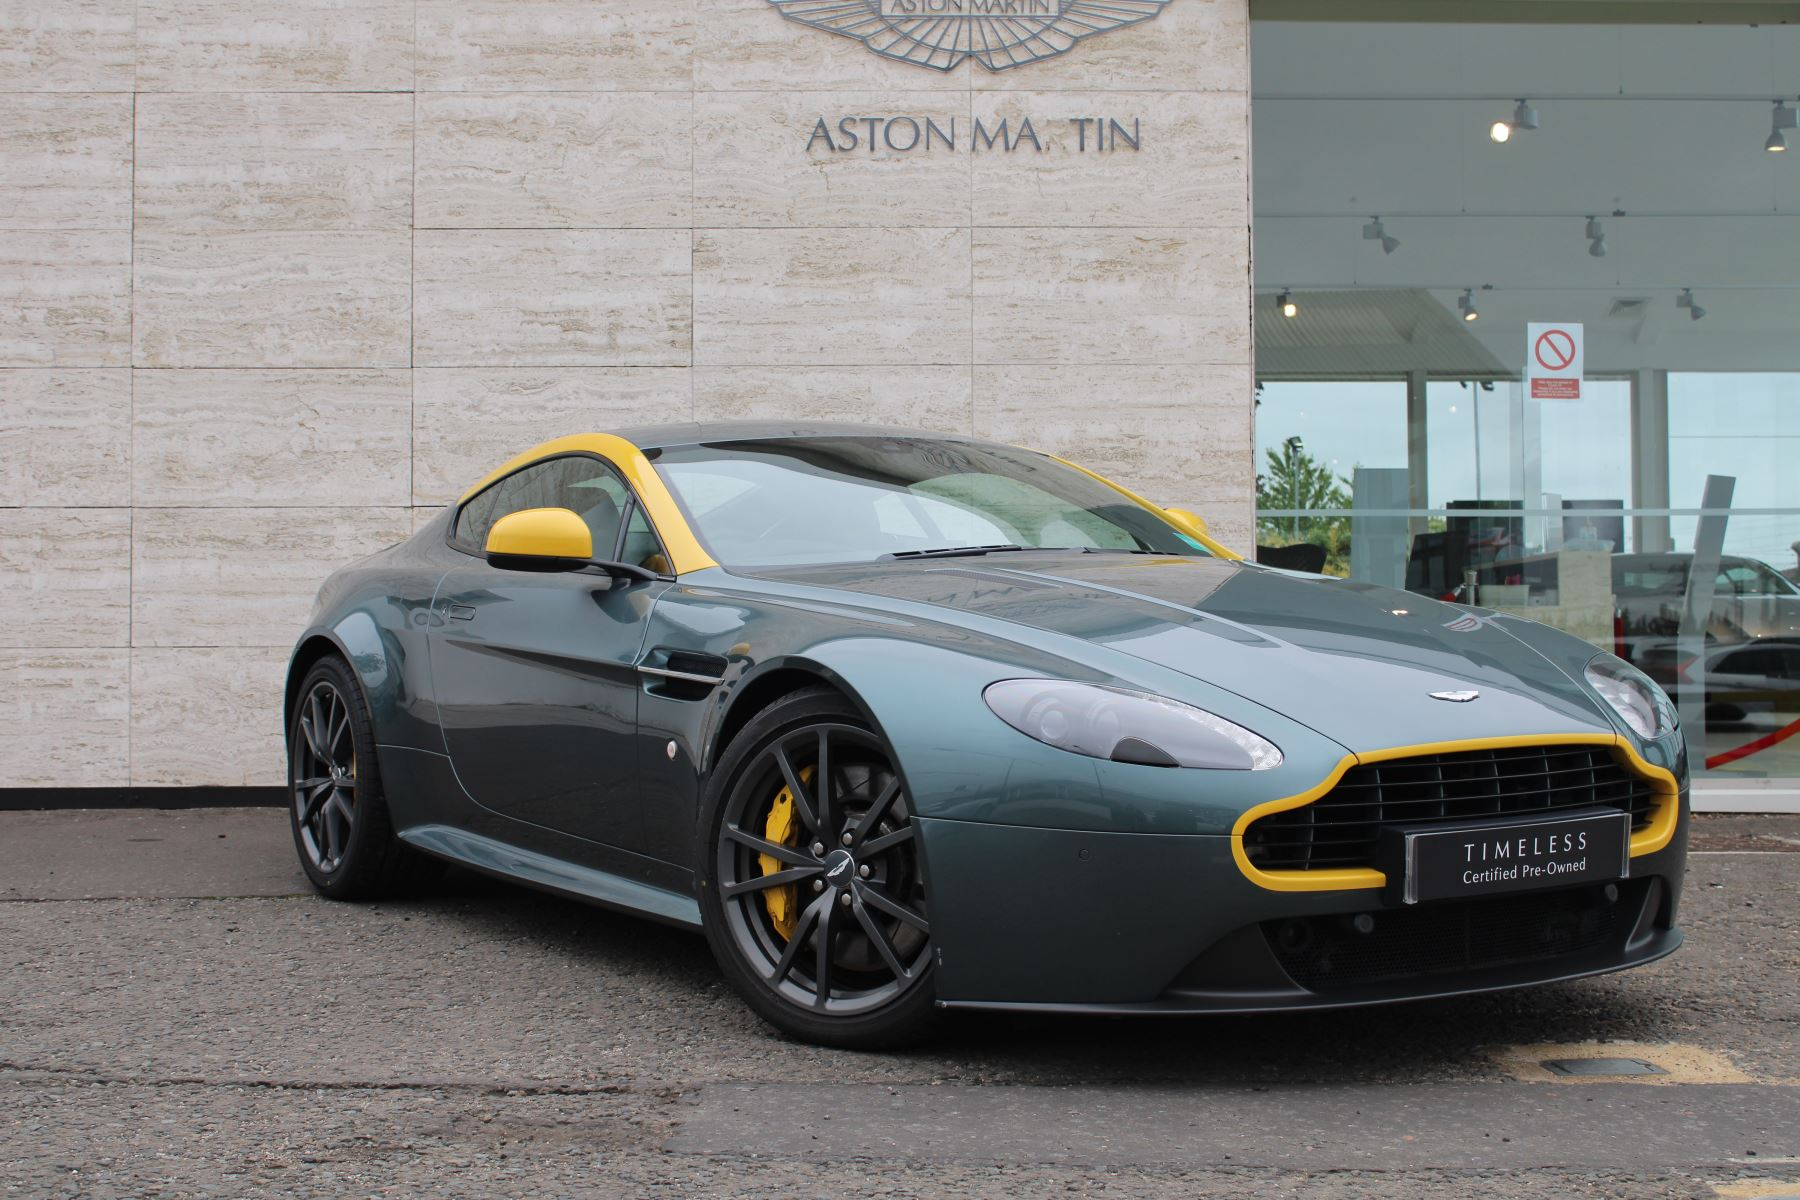 Aston Martin V8 Vantage N430 2dr 4.7 3 door Coupe (2015)